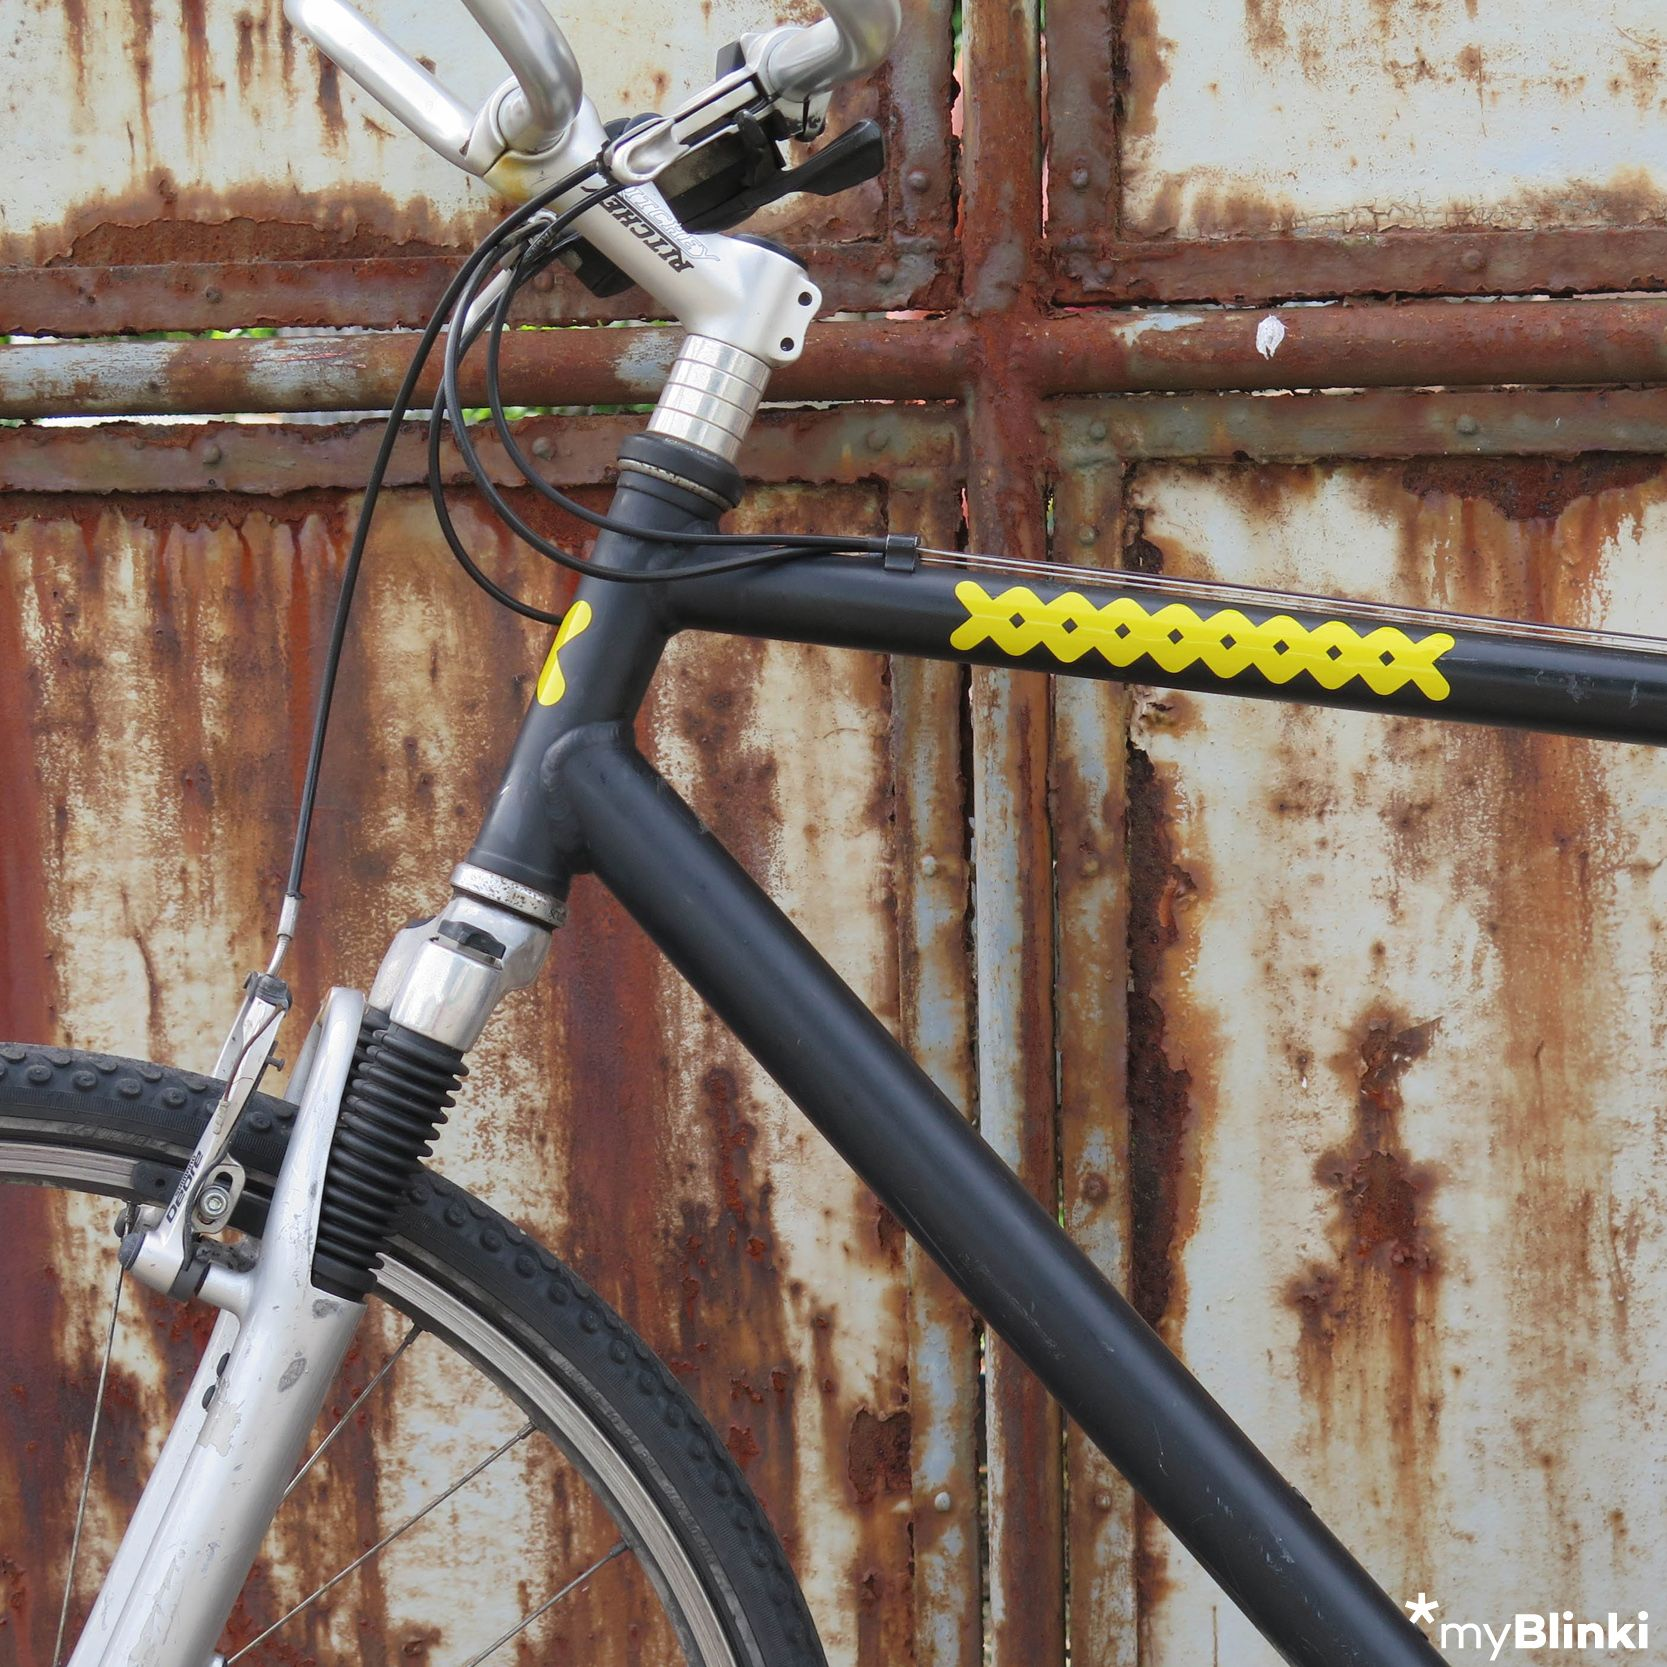 bicycle accessories by www.myblinki-fahrrad-aufkleber.de | bicycle ...